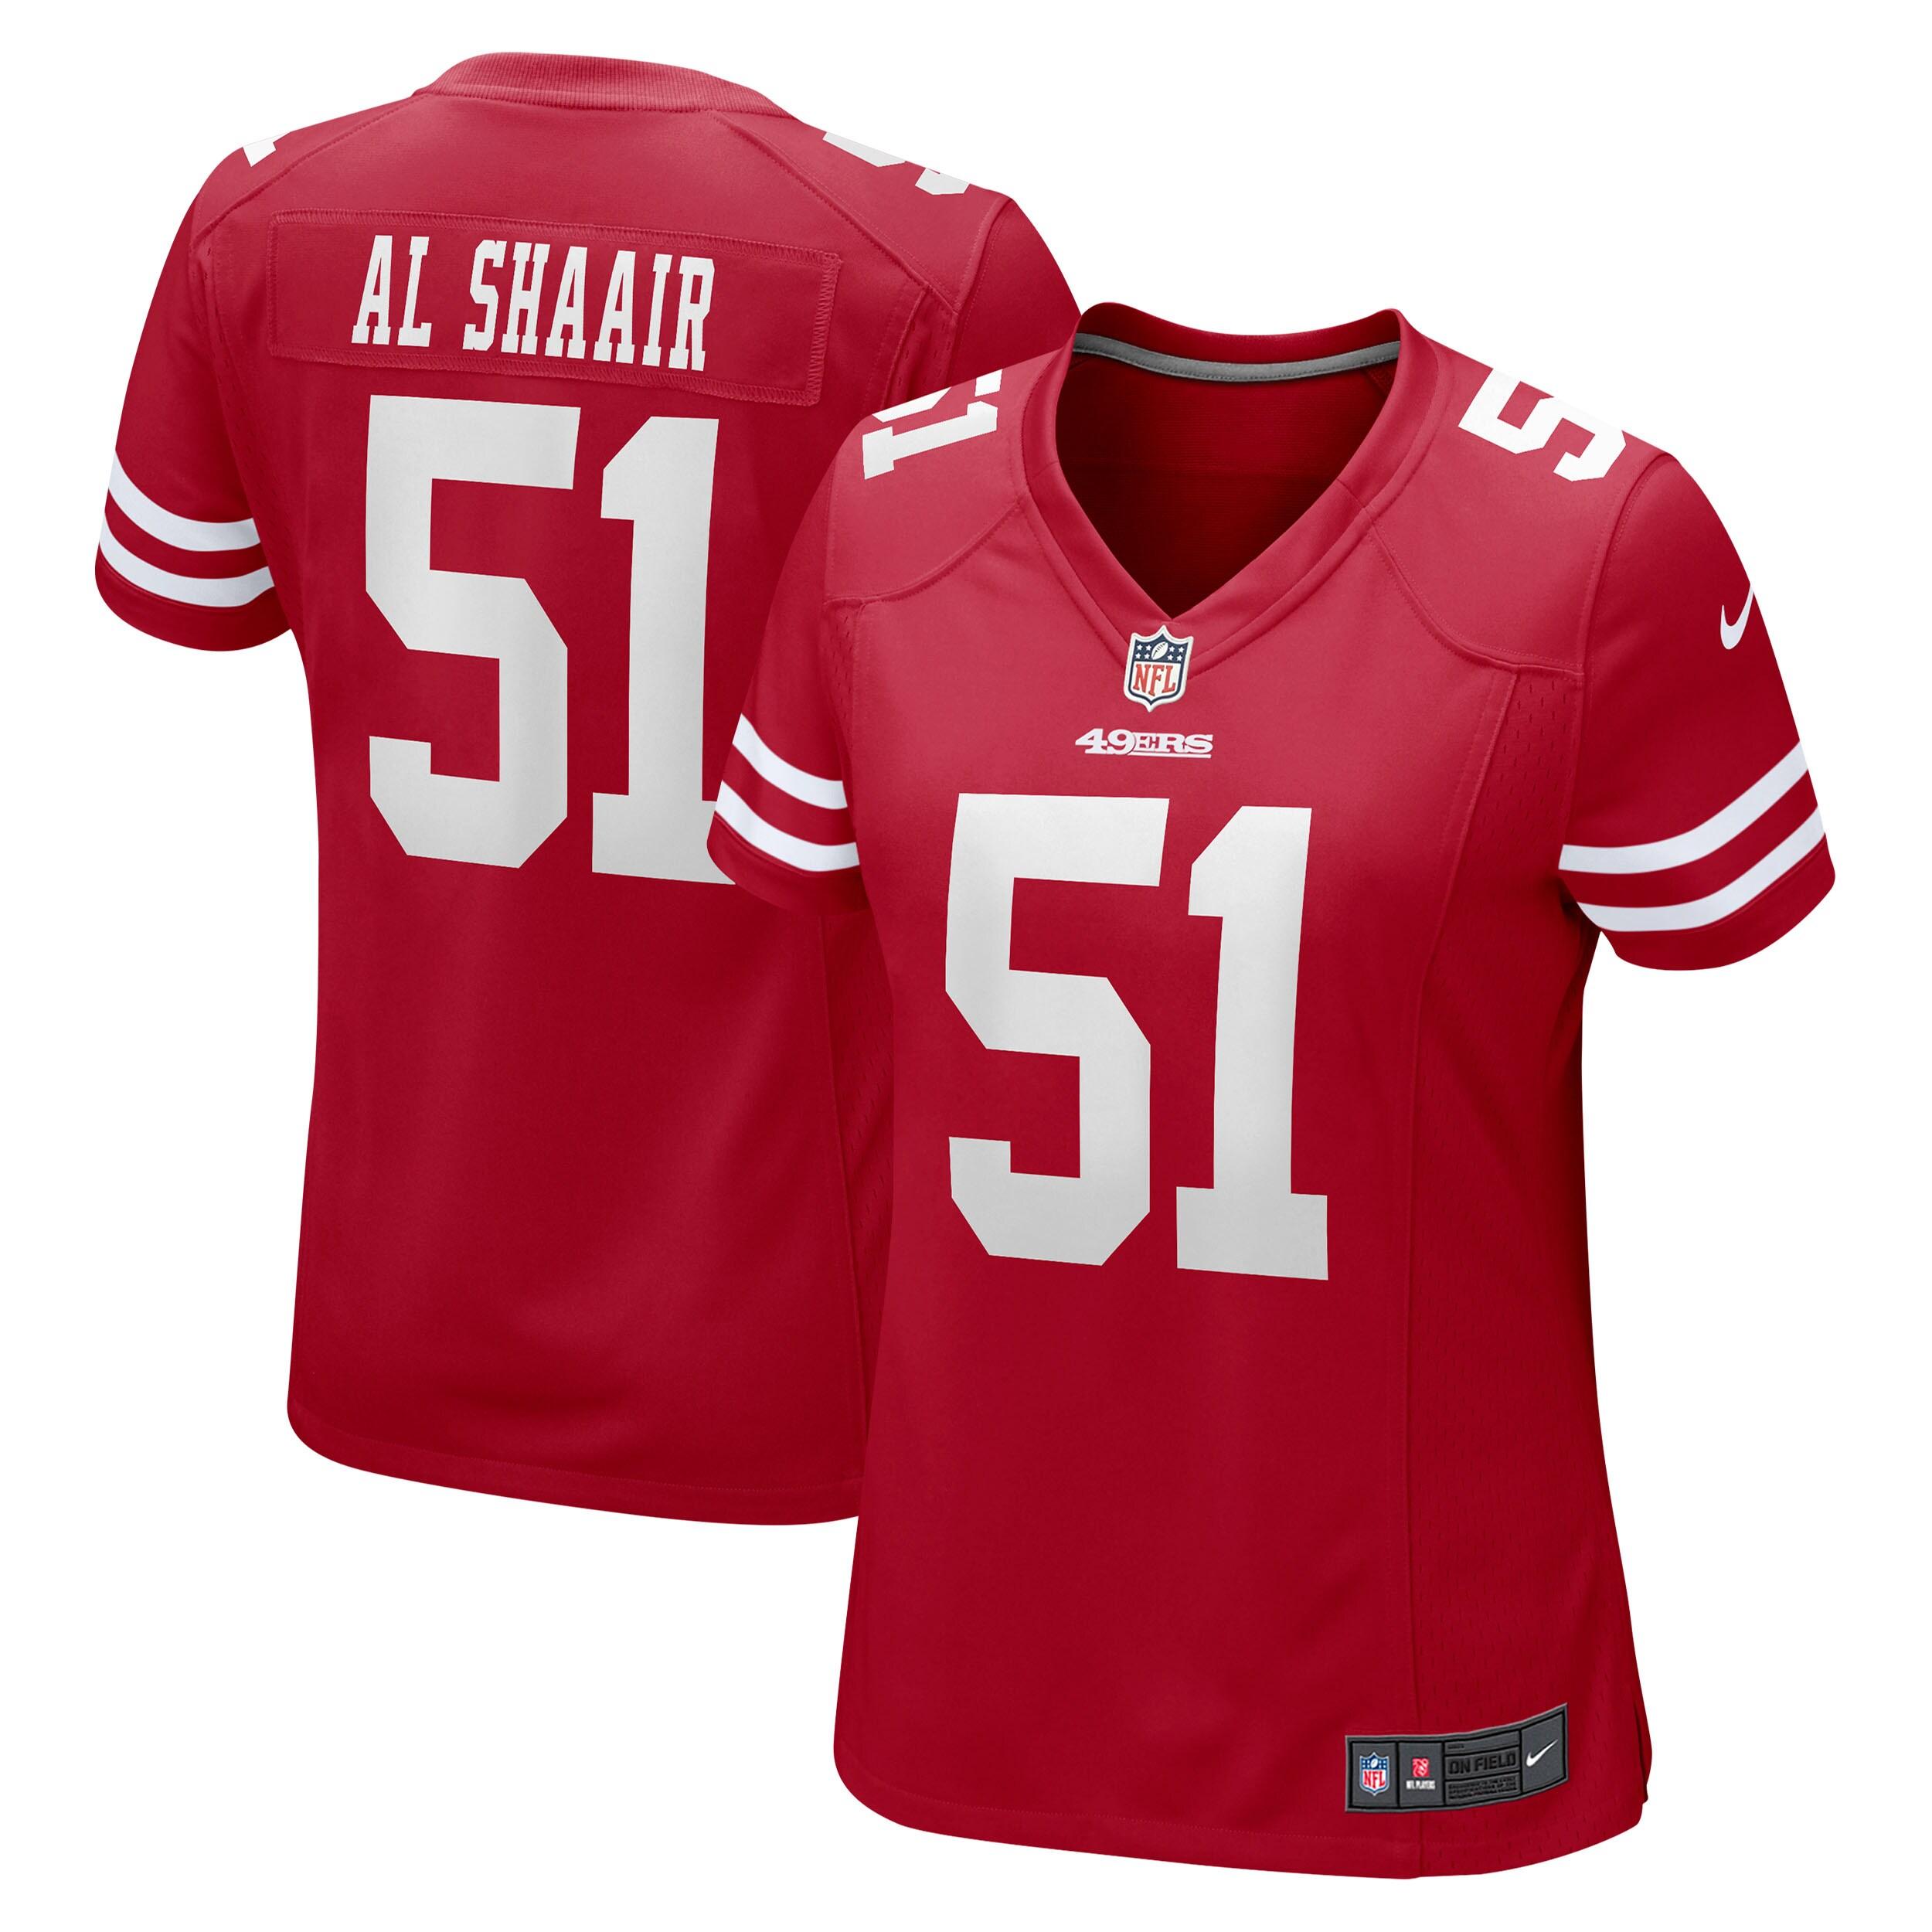 Azeez Al-Shaair San Francisco 49ers Nike Women's Team Game Jersey - Scarlet